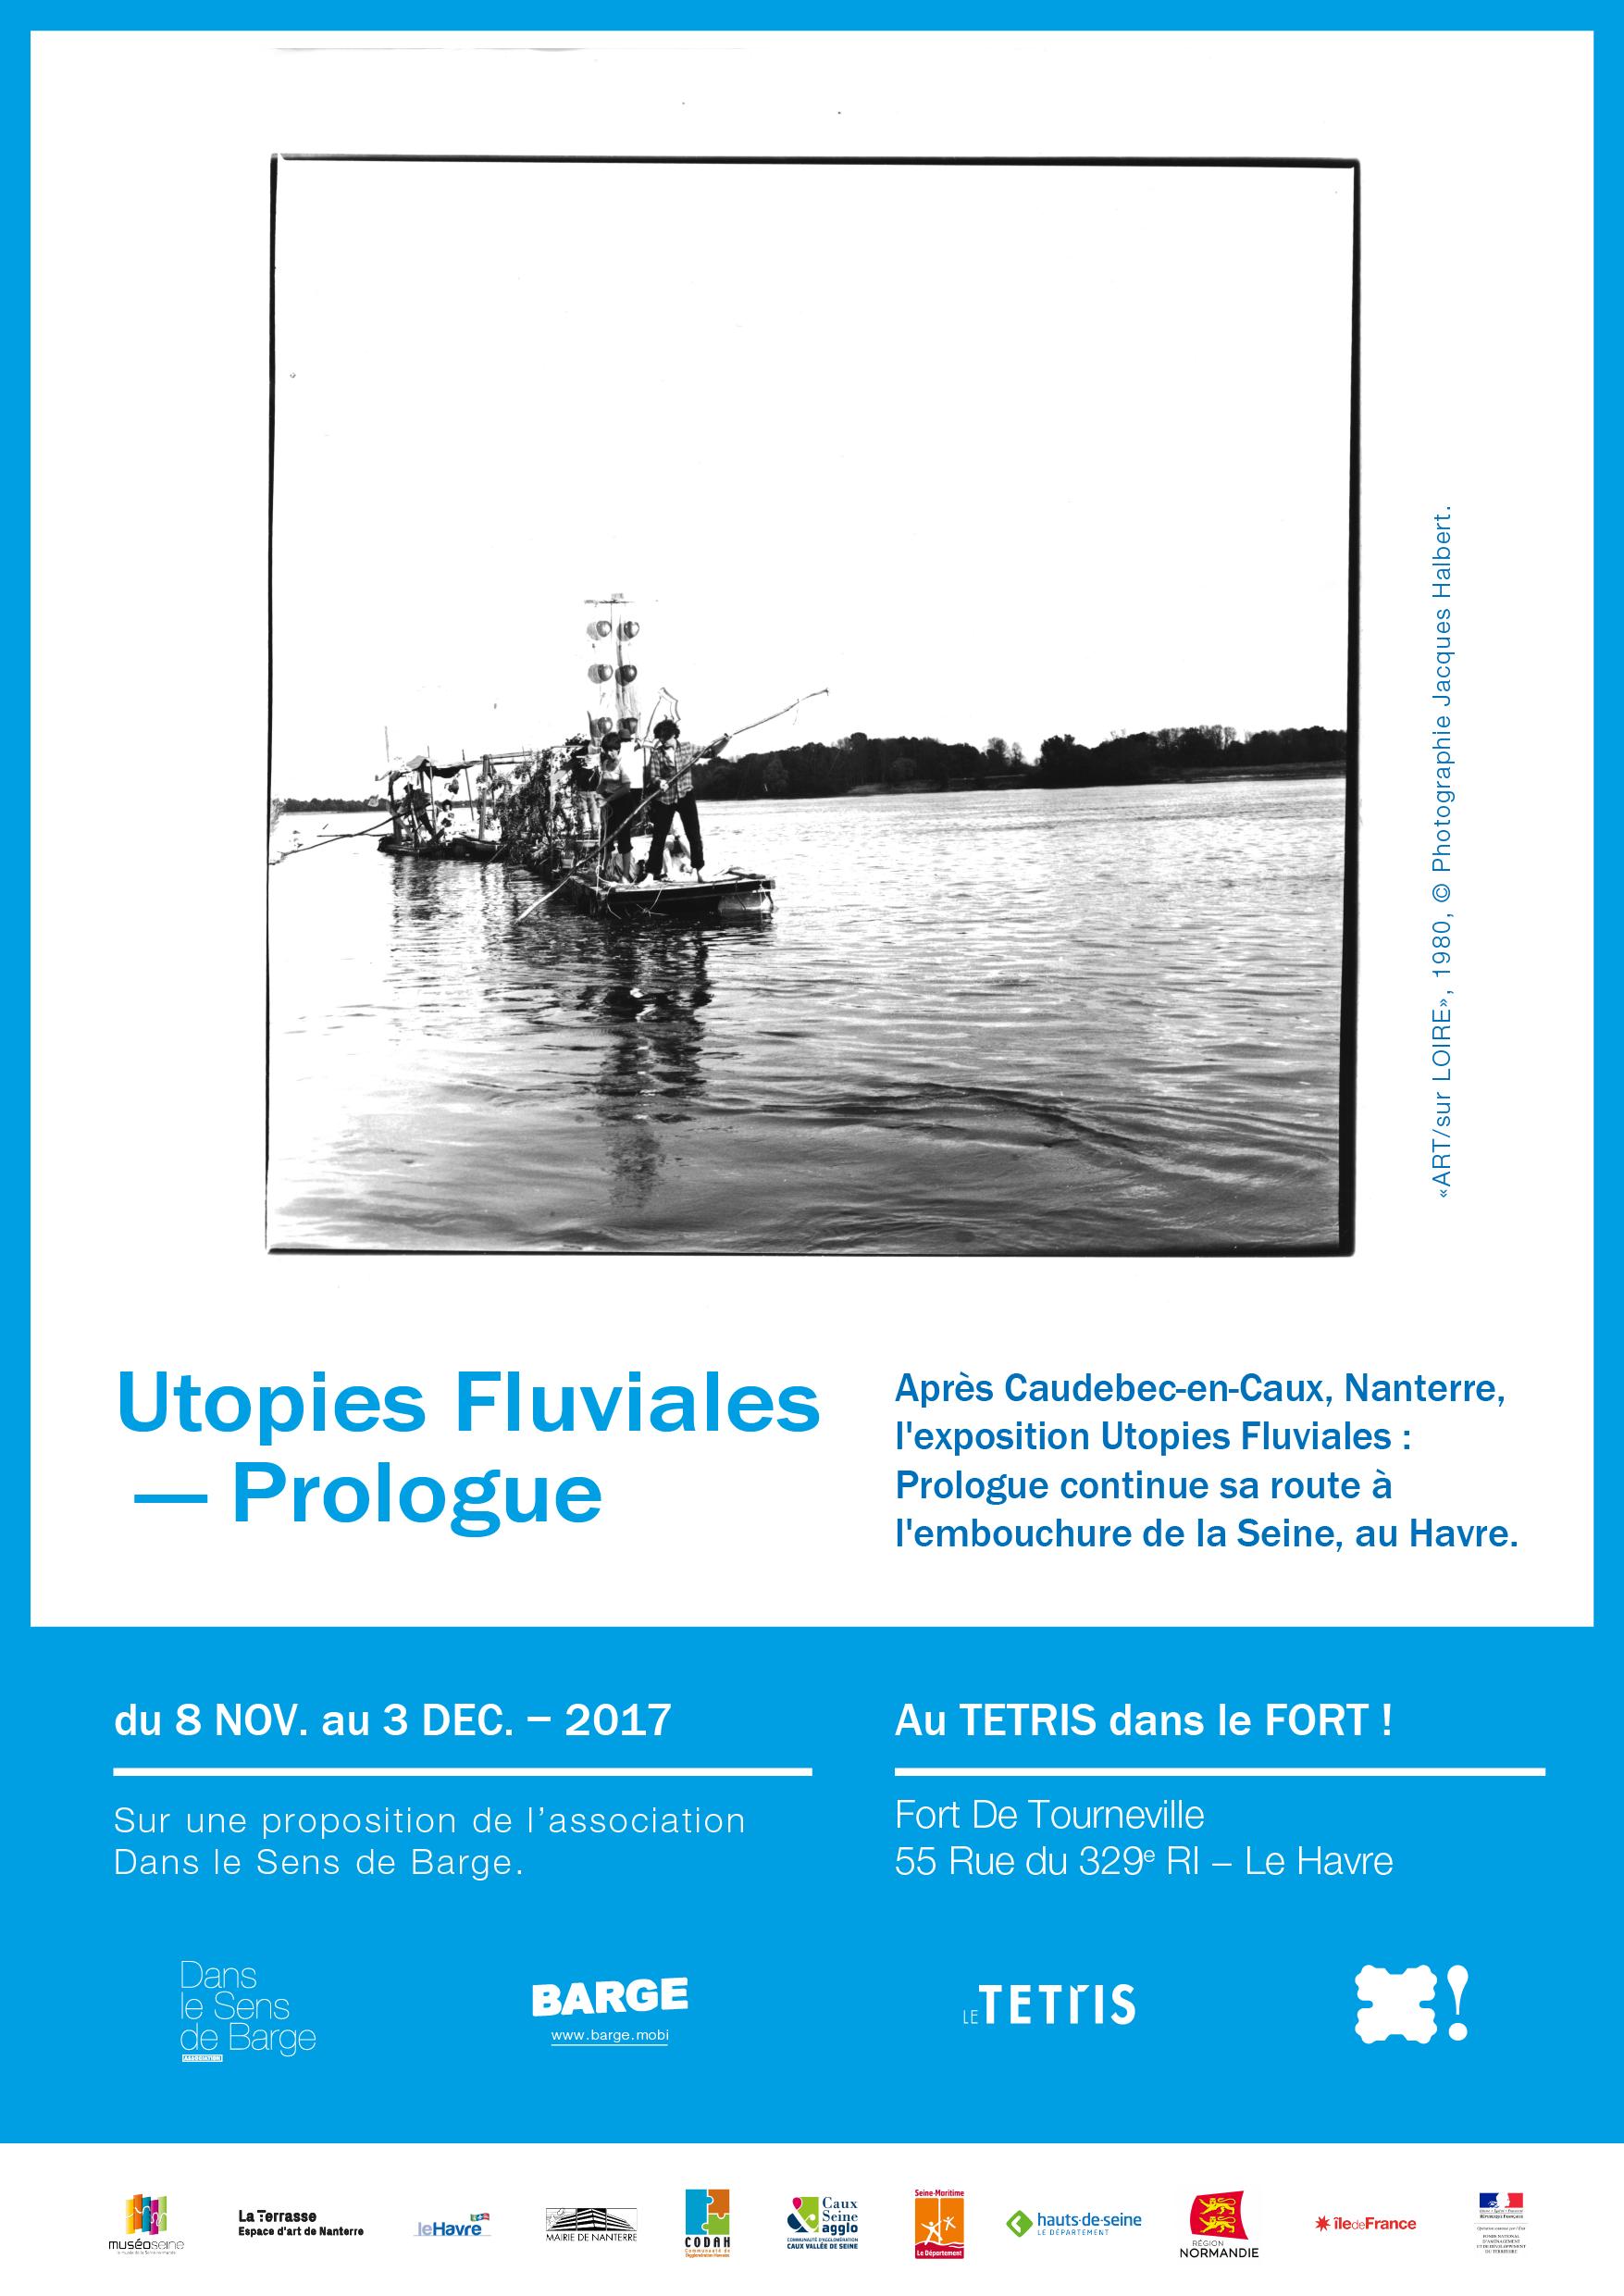 Utopies fluviales au Havre 2017